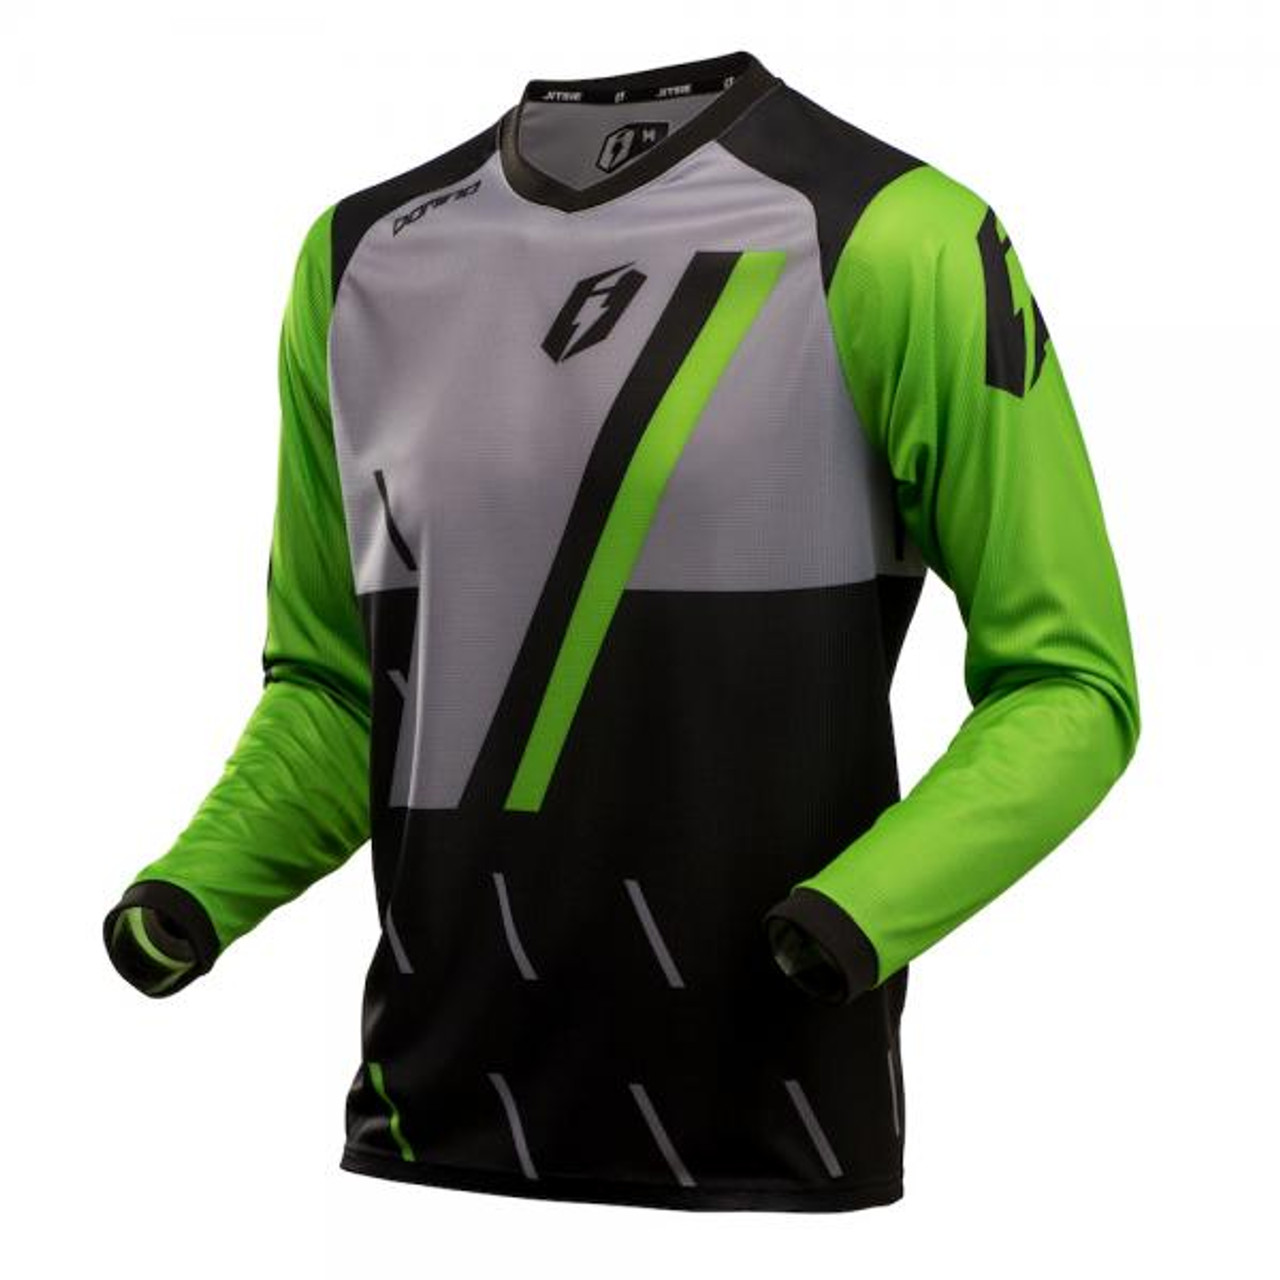 Jersey L3 Domino, black/fluo green/ silver